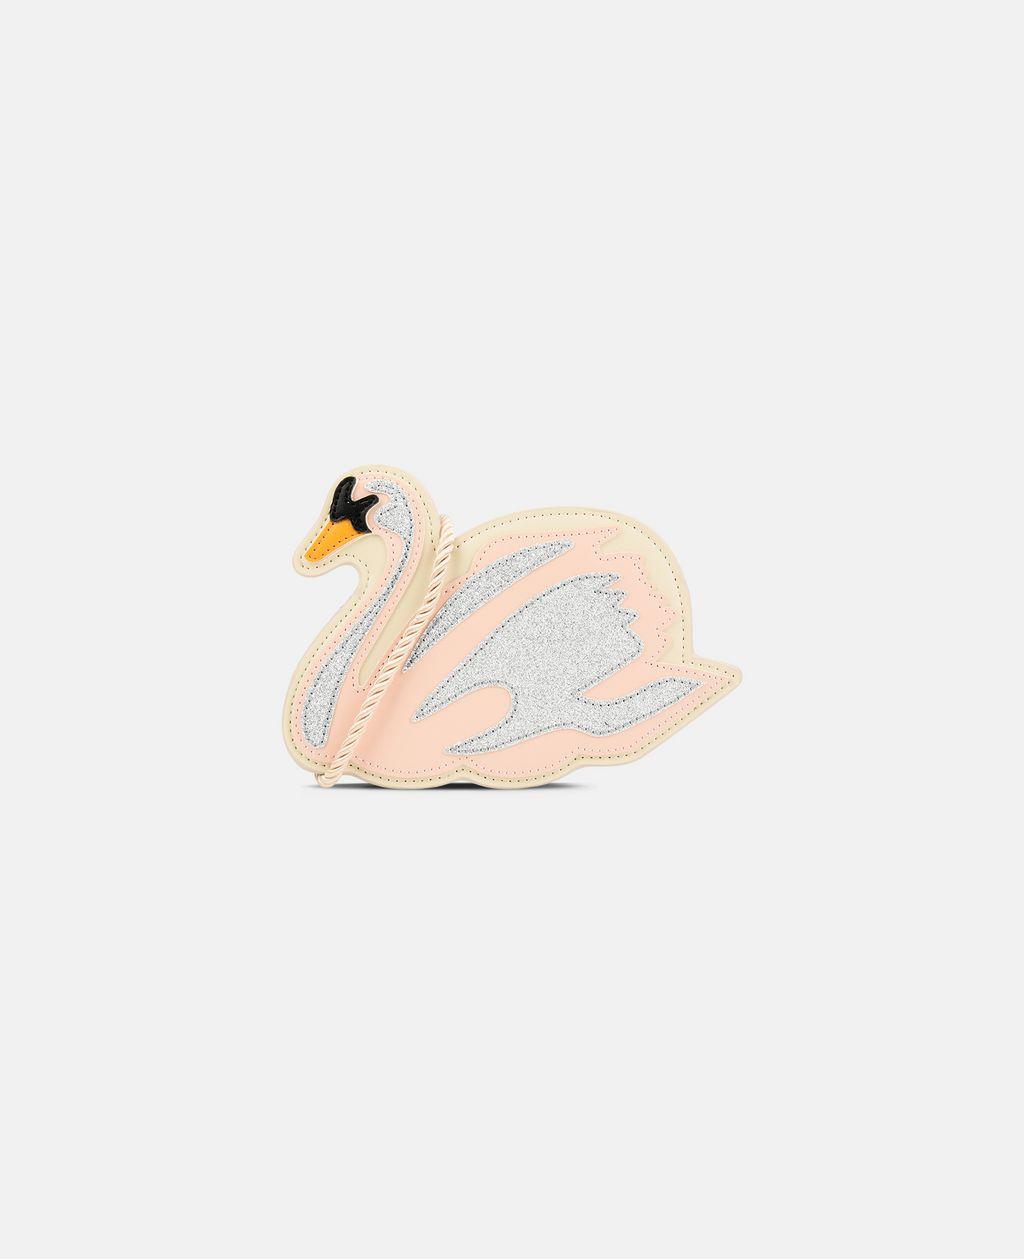 Petit sac cygne rose - STELLA MCCARTNEY KIDS